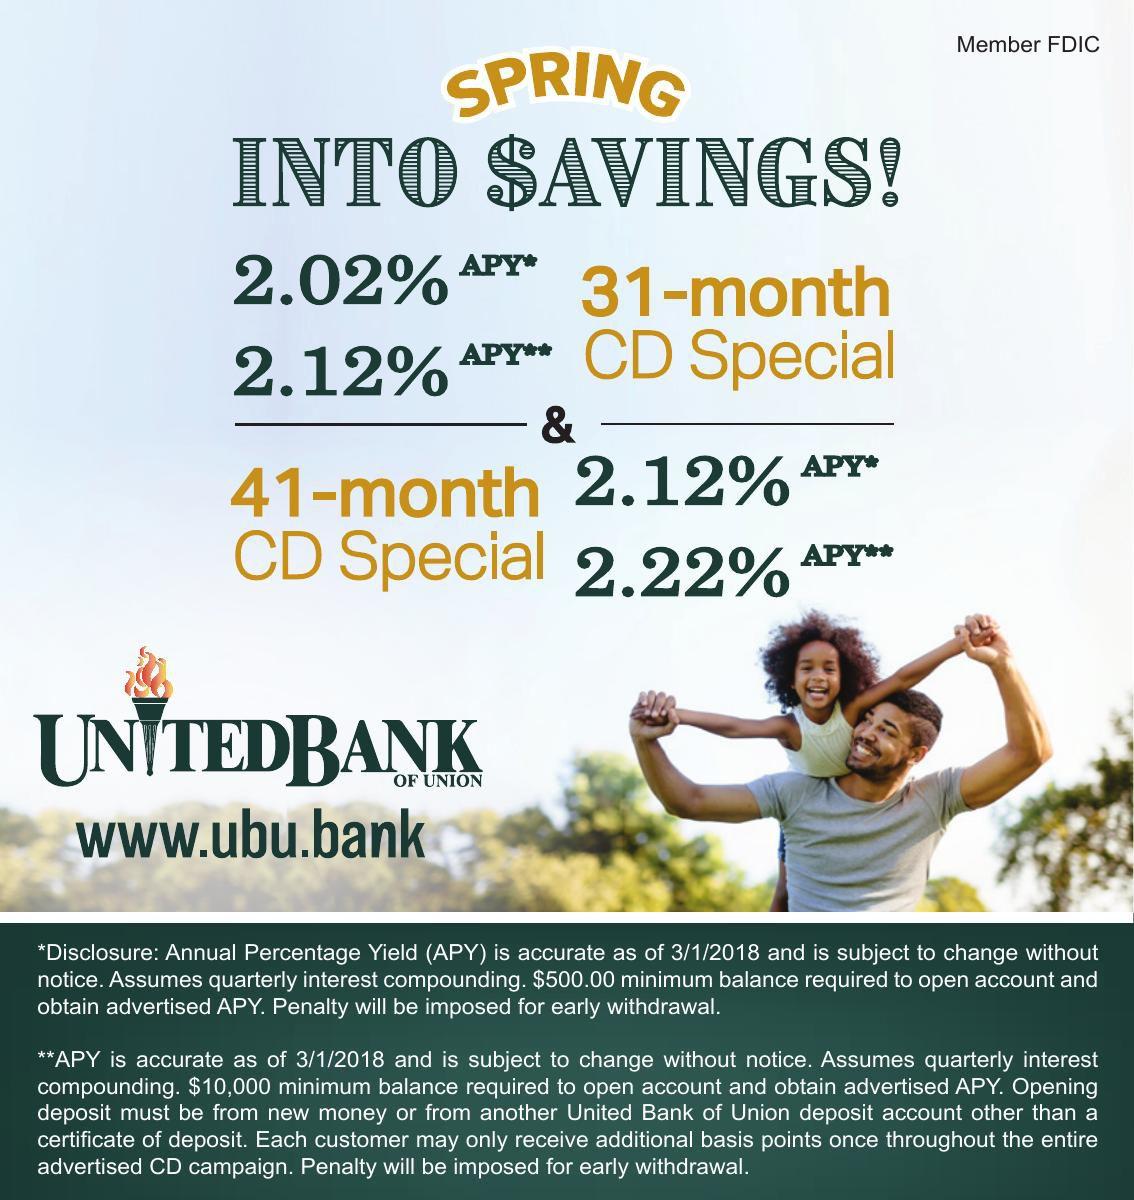 United Bank of Union